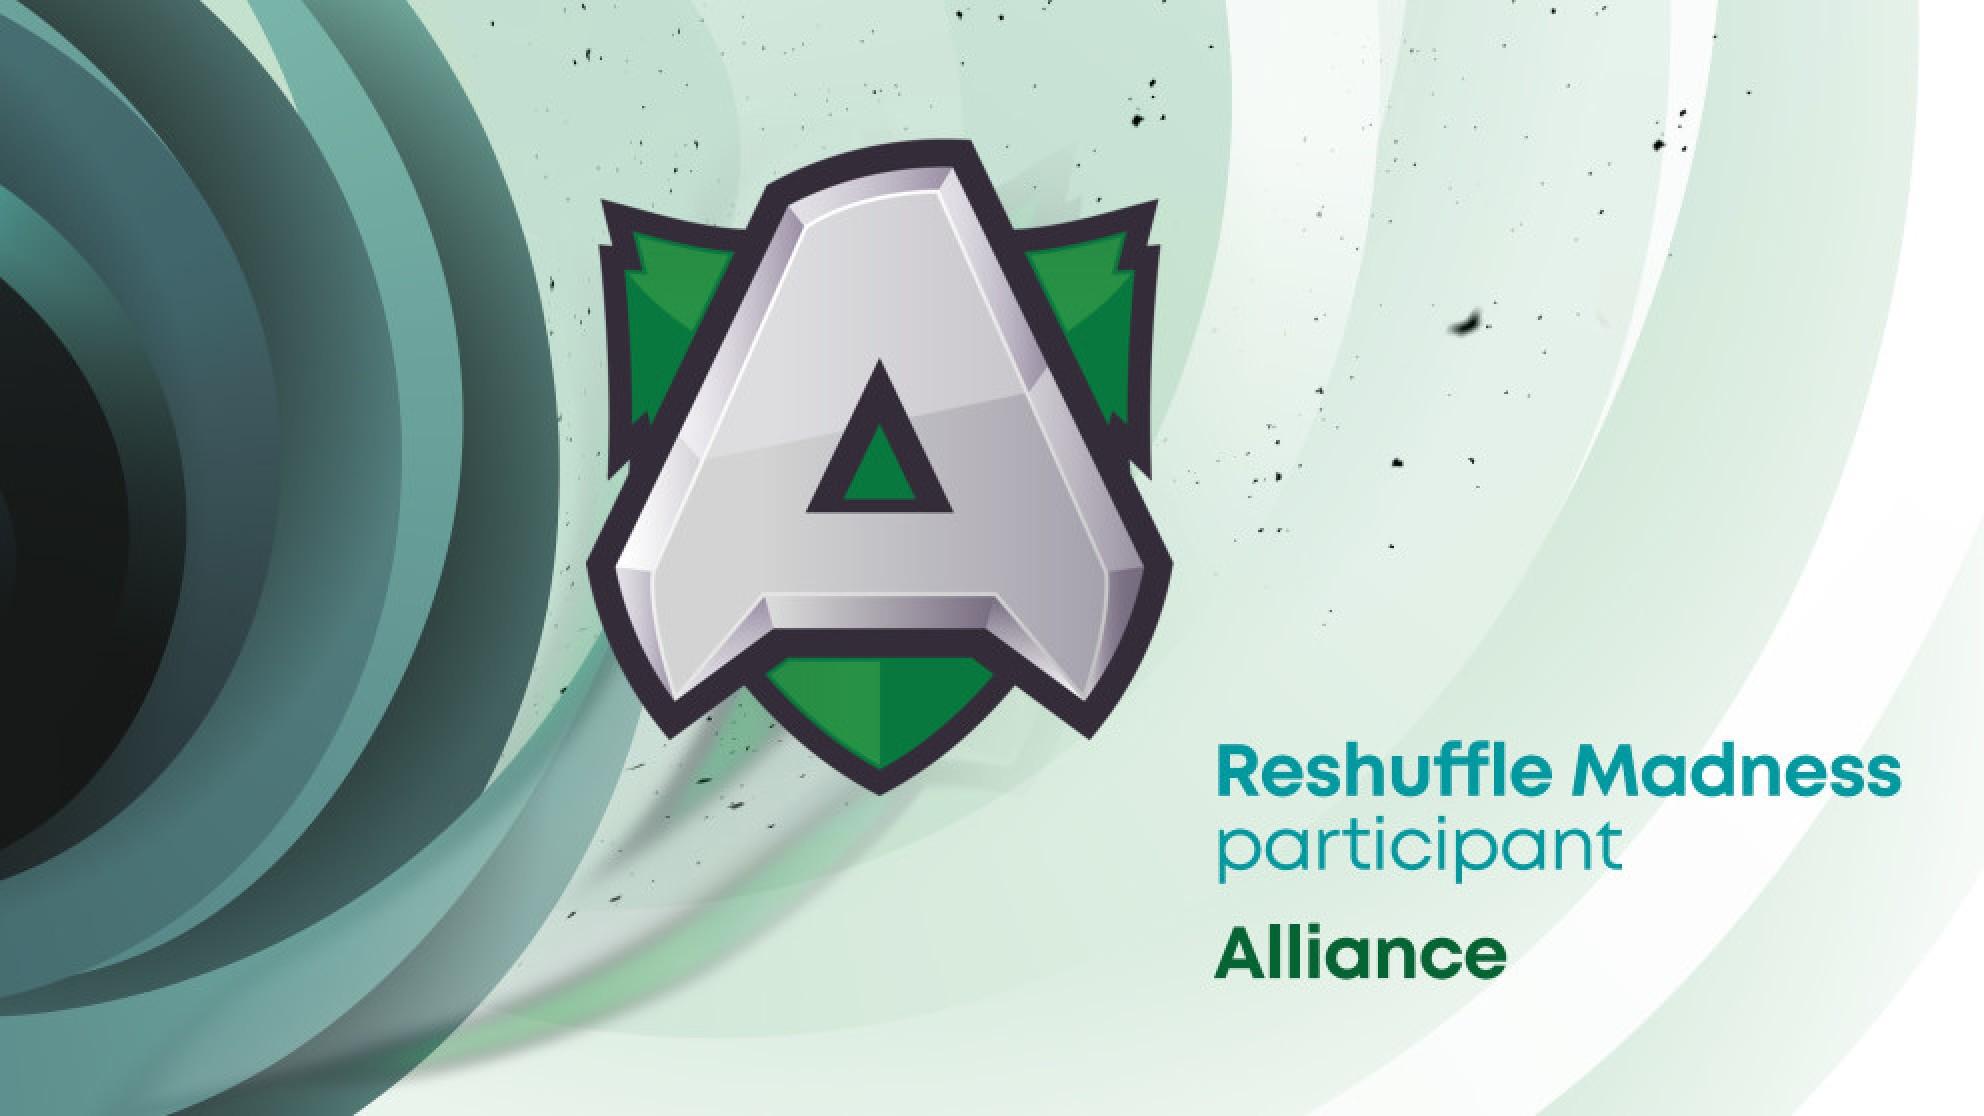 Alliance join WePlay! Dota 2 Reshuffle Madness